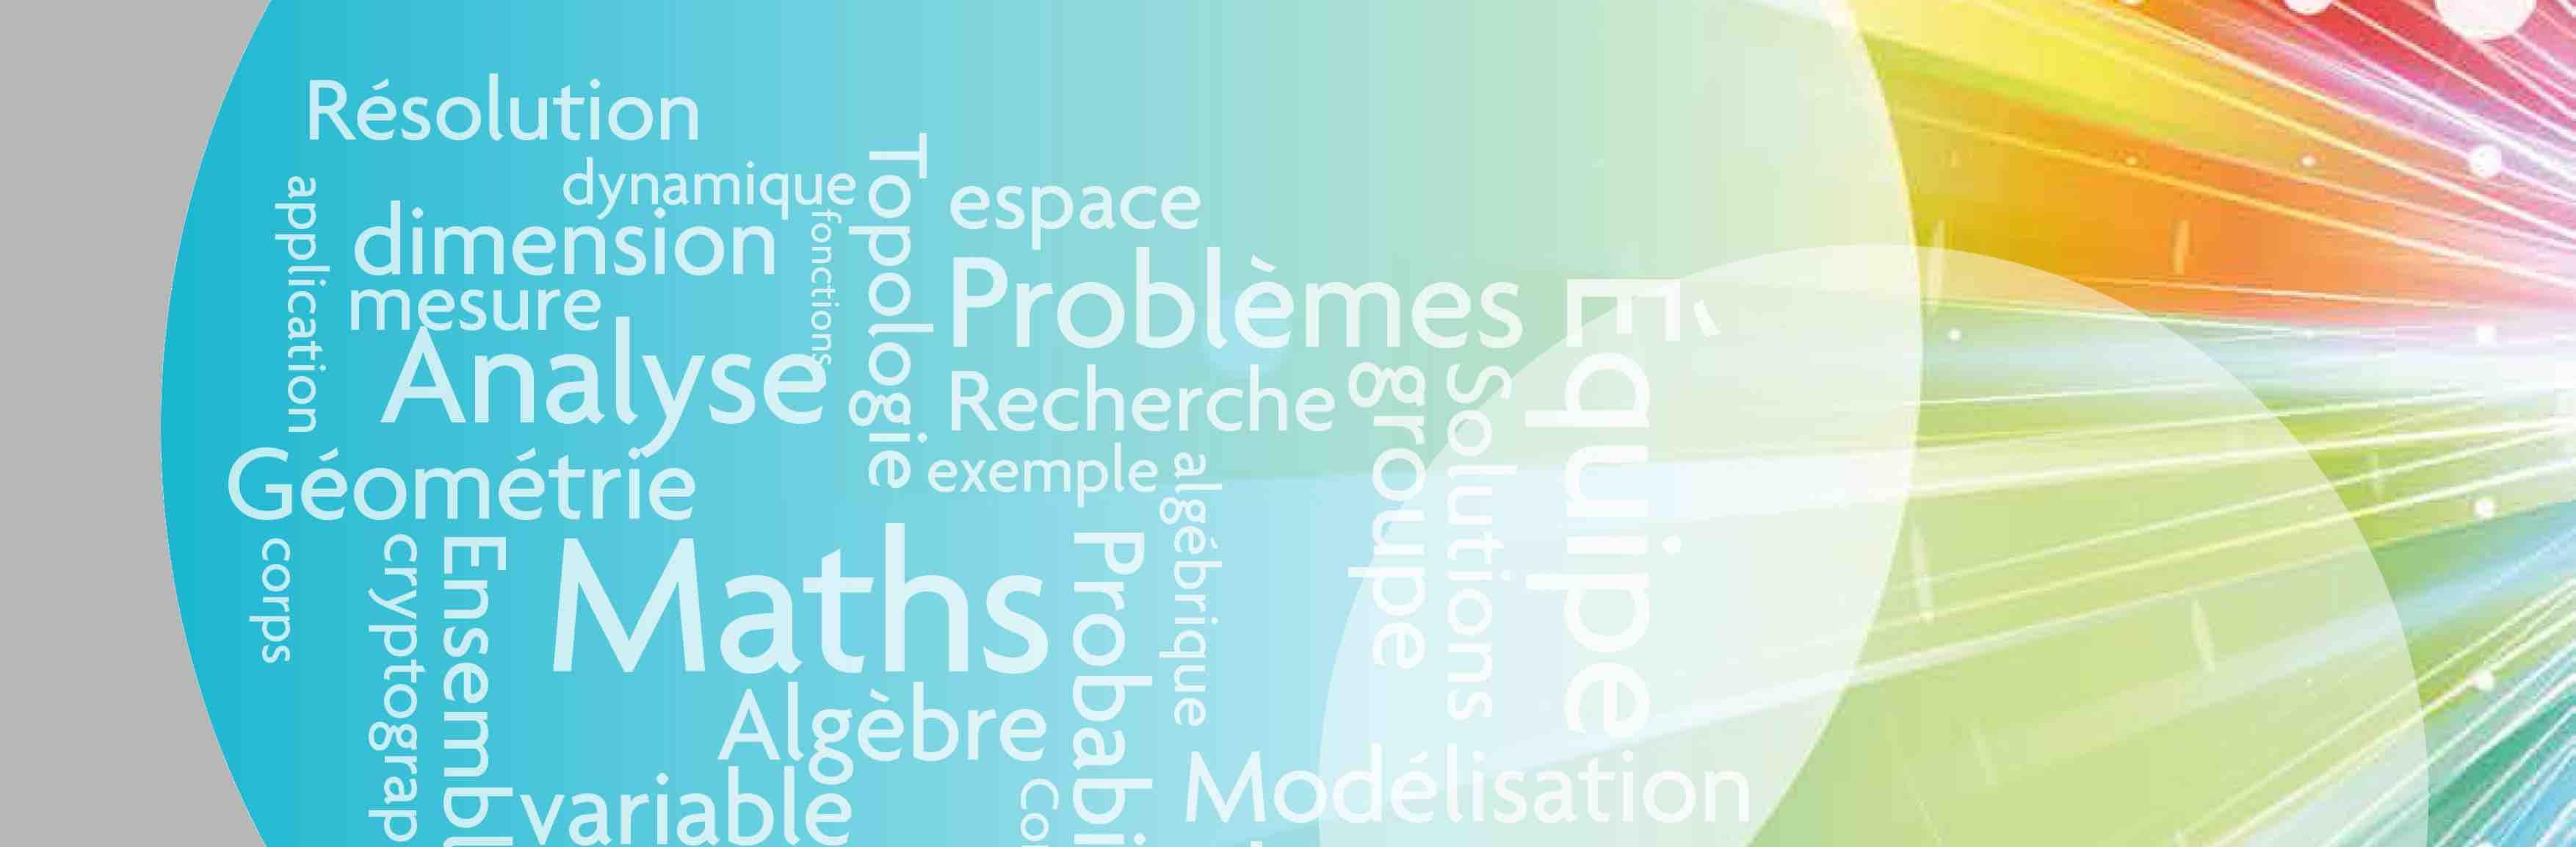 Concours SMF Junior 2018 - Les solutions